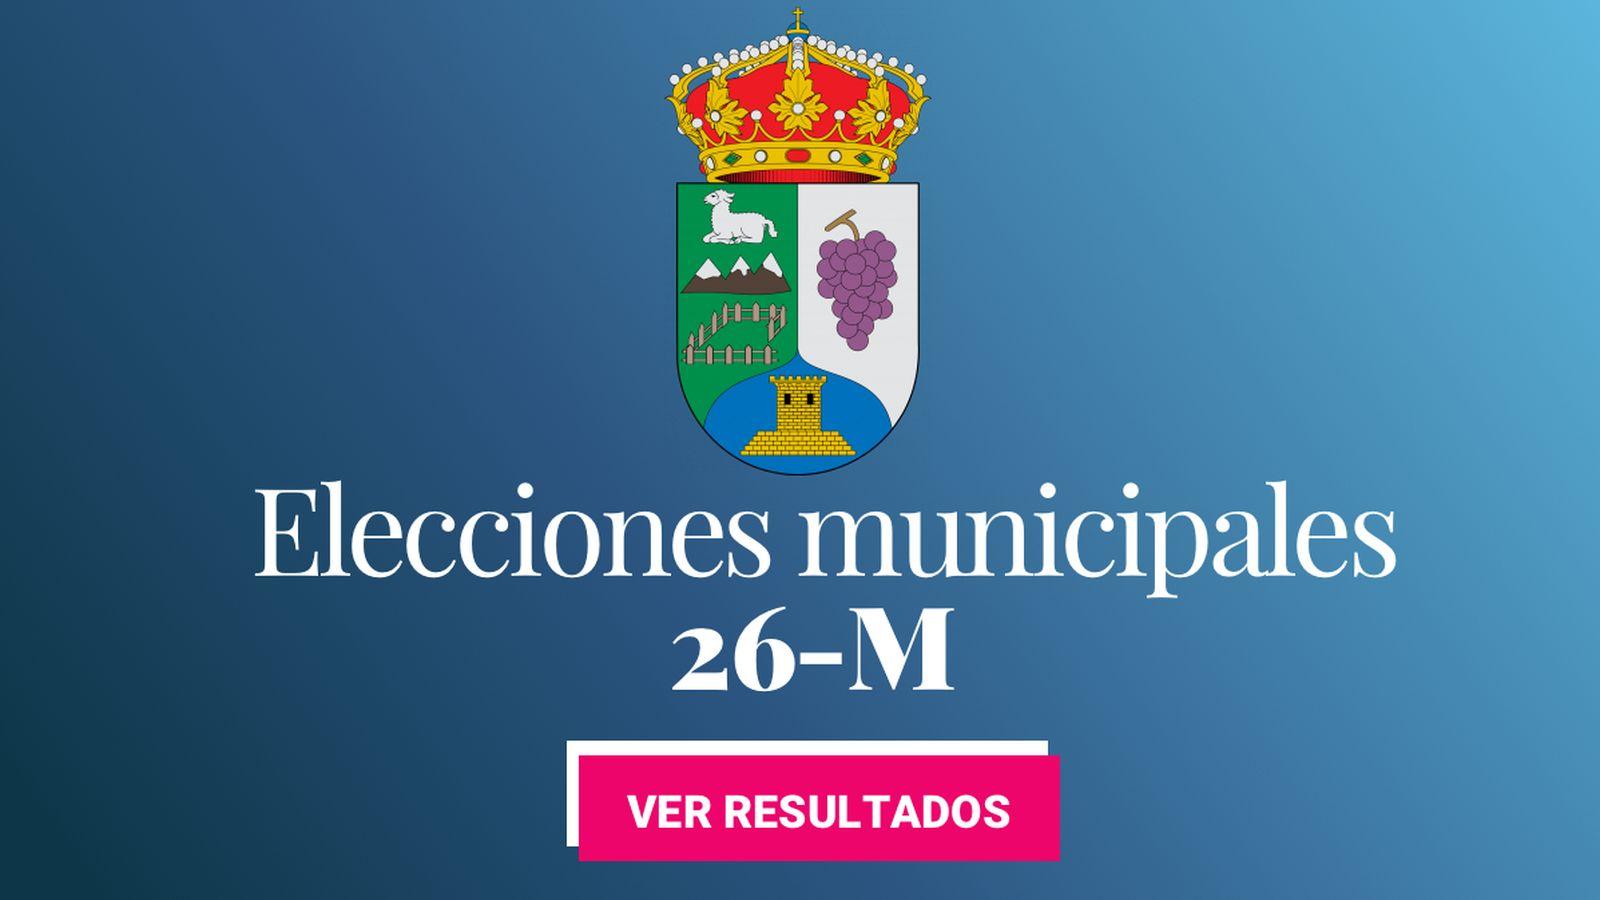 Foto: Elecciones municipales 2019 en Majadahonda. (C.C./EC)